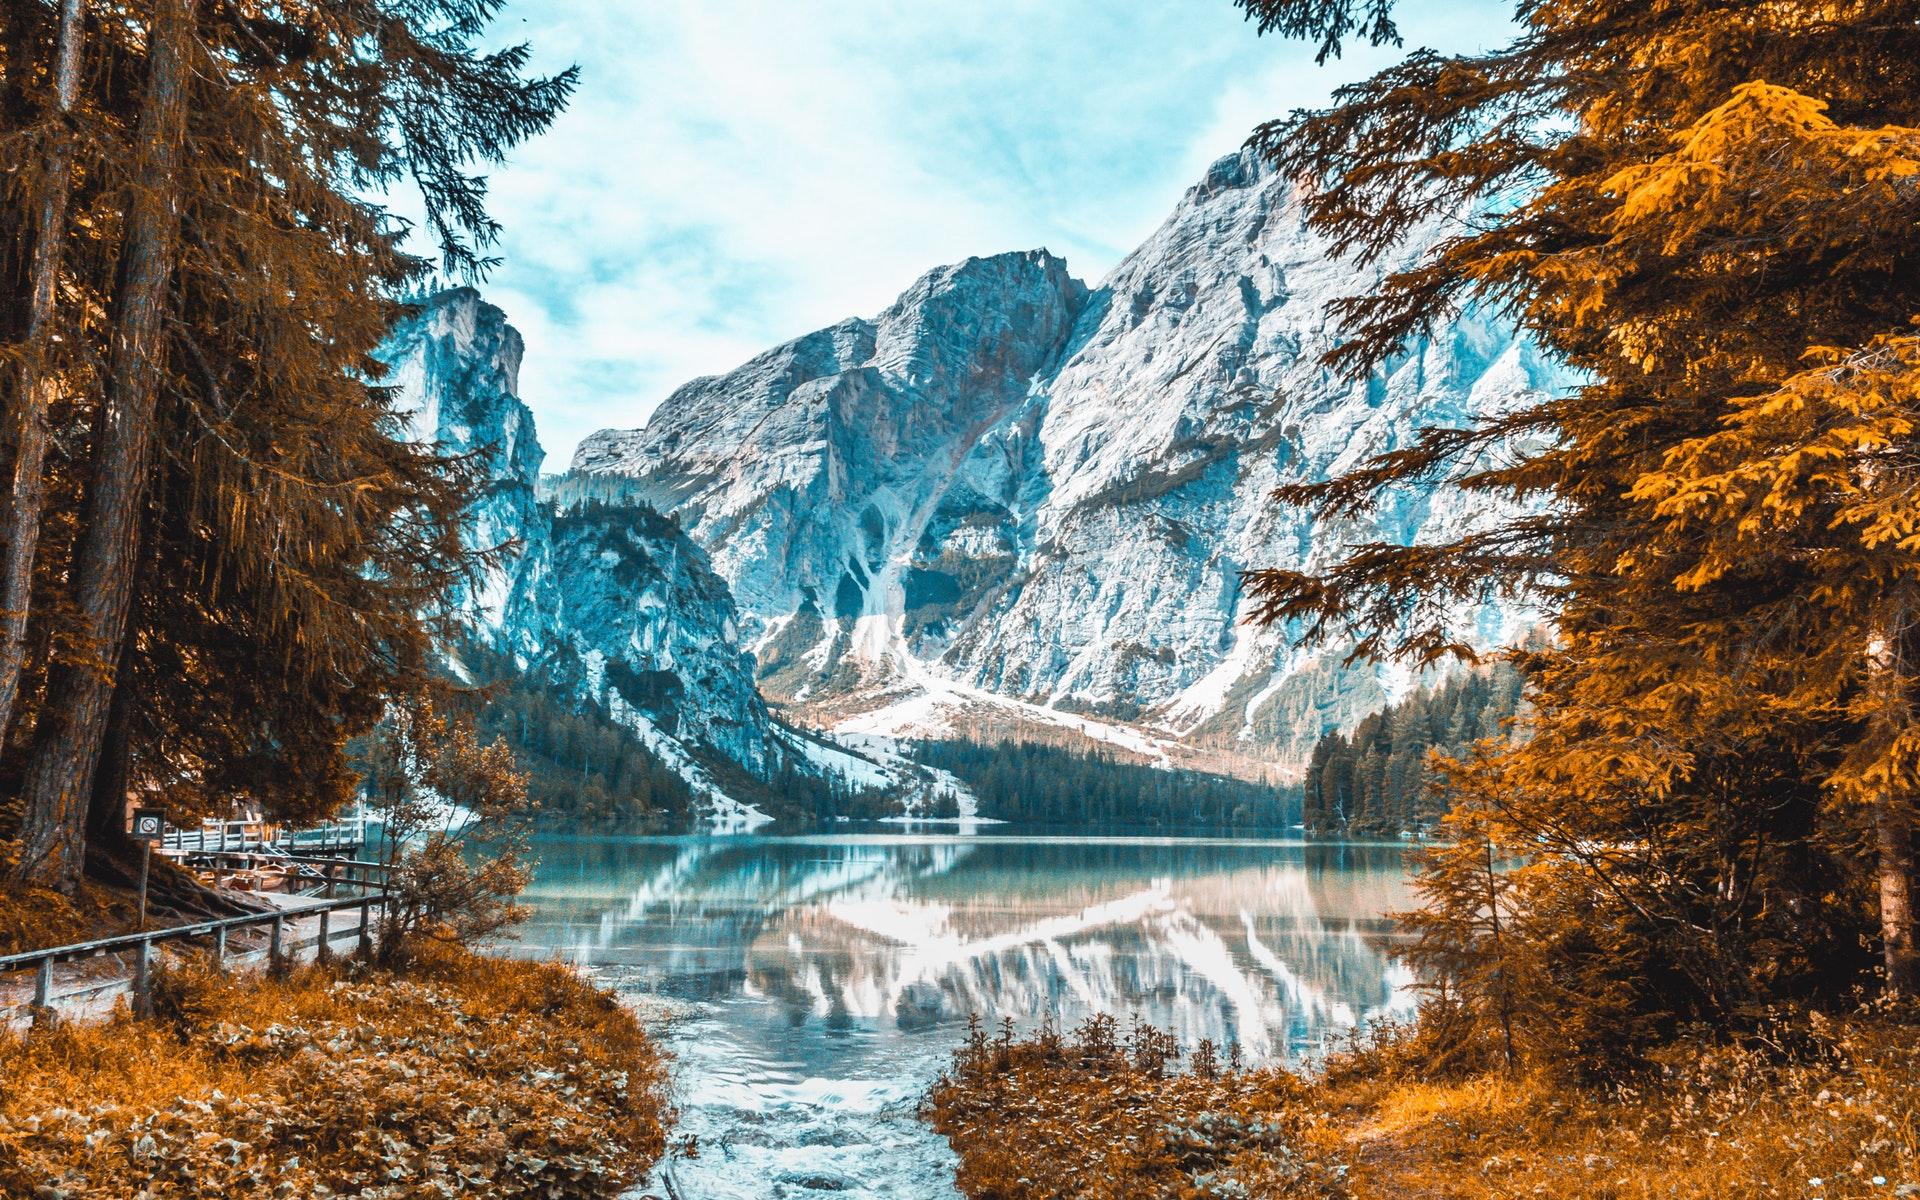 The Beauty of autumn